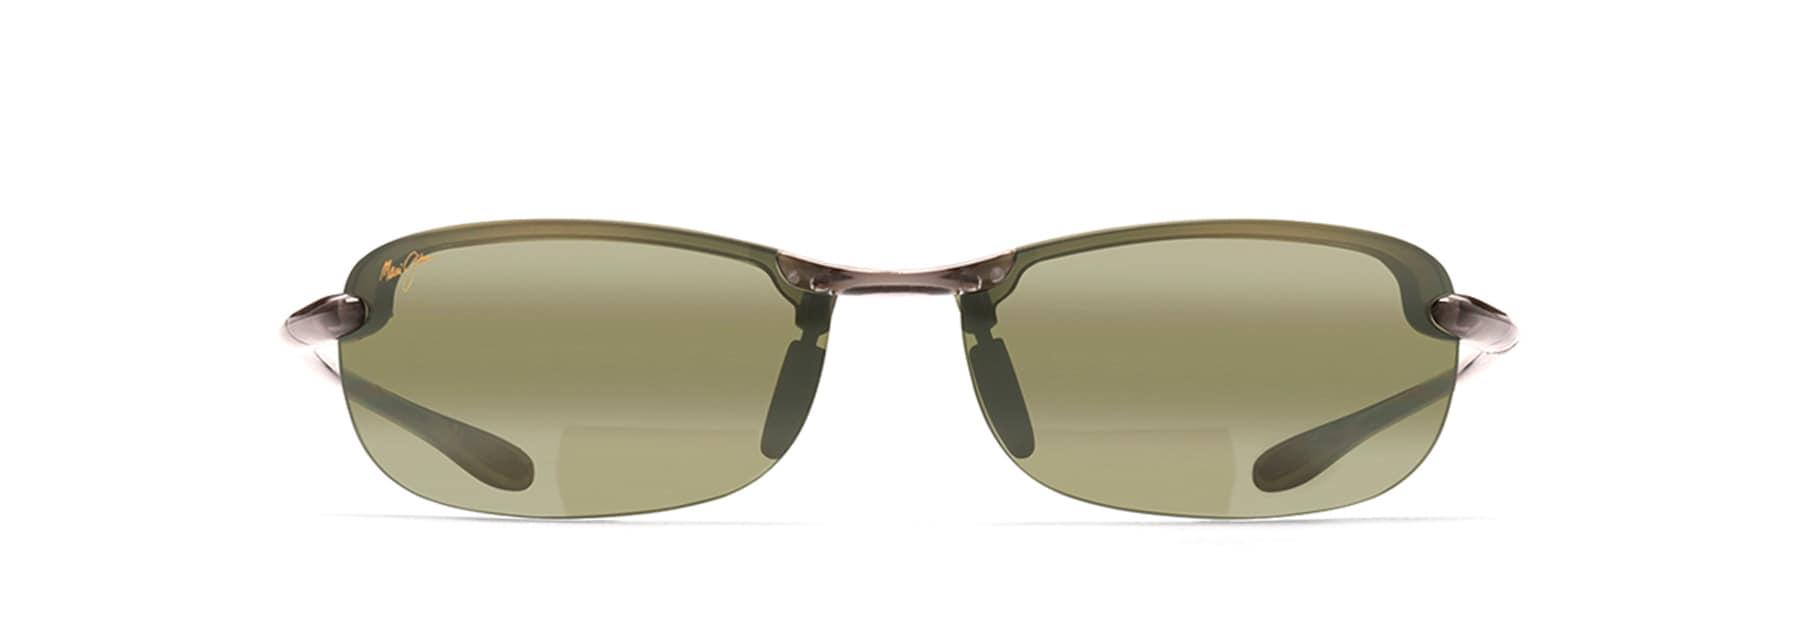 12527c819e8 Makaha Reader Polarized Sunglasses